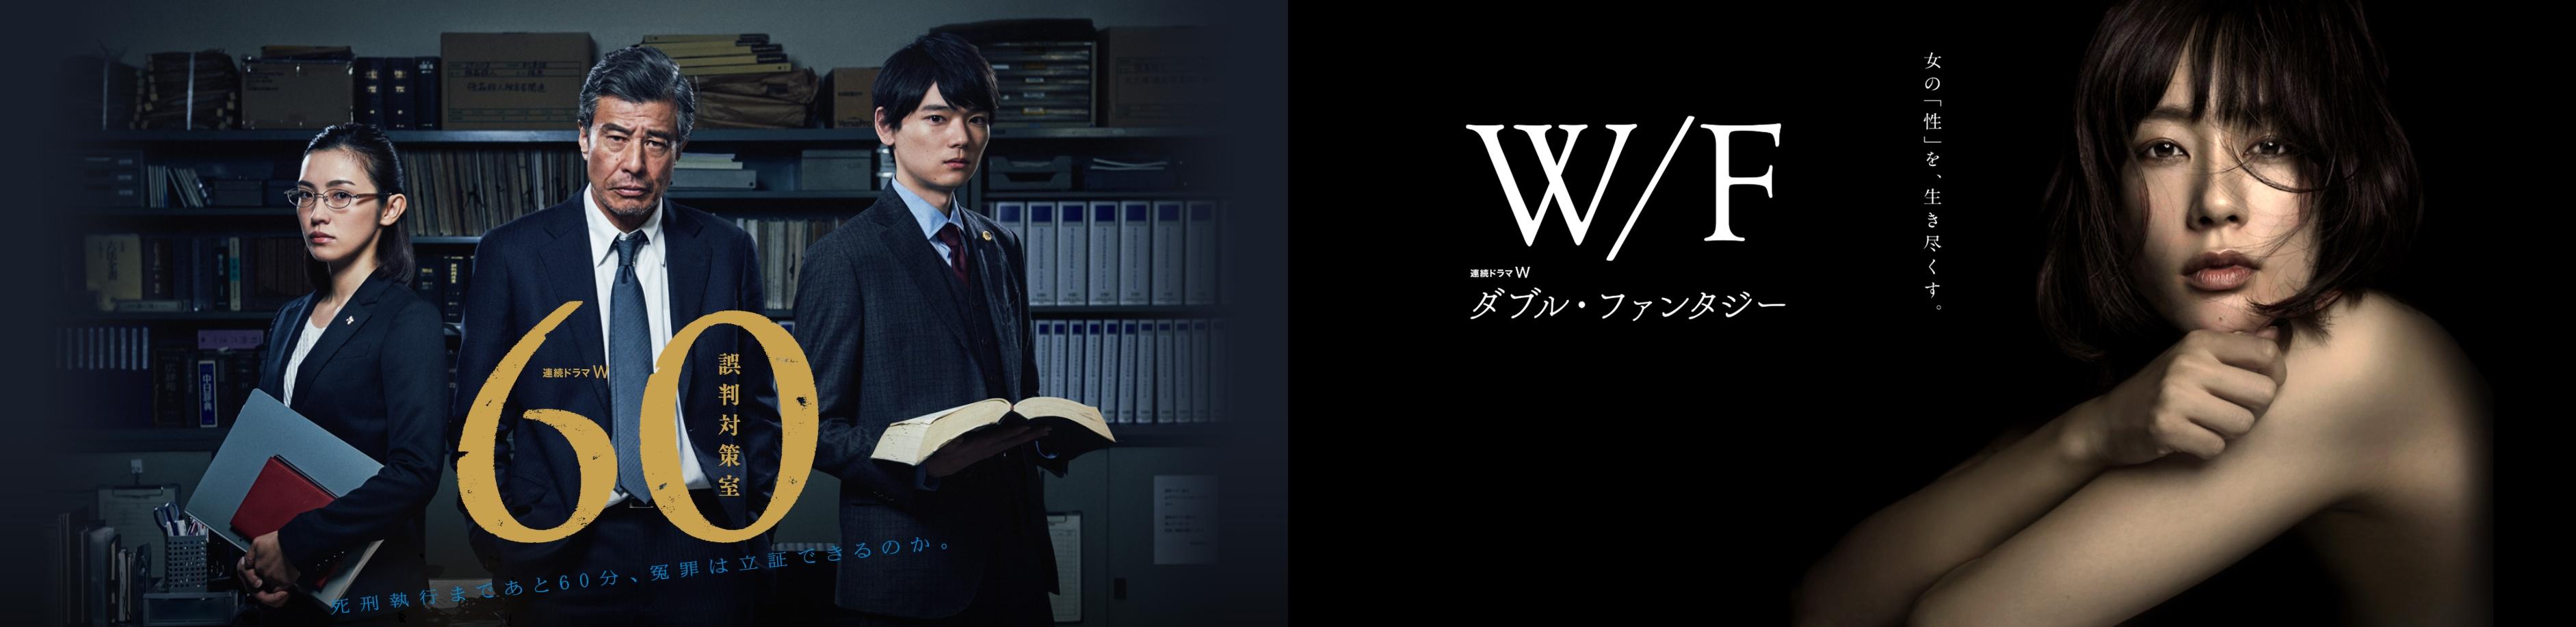 WOWOW ドラマ2